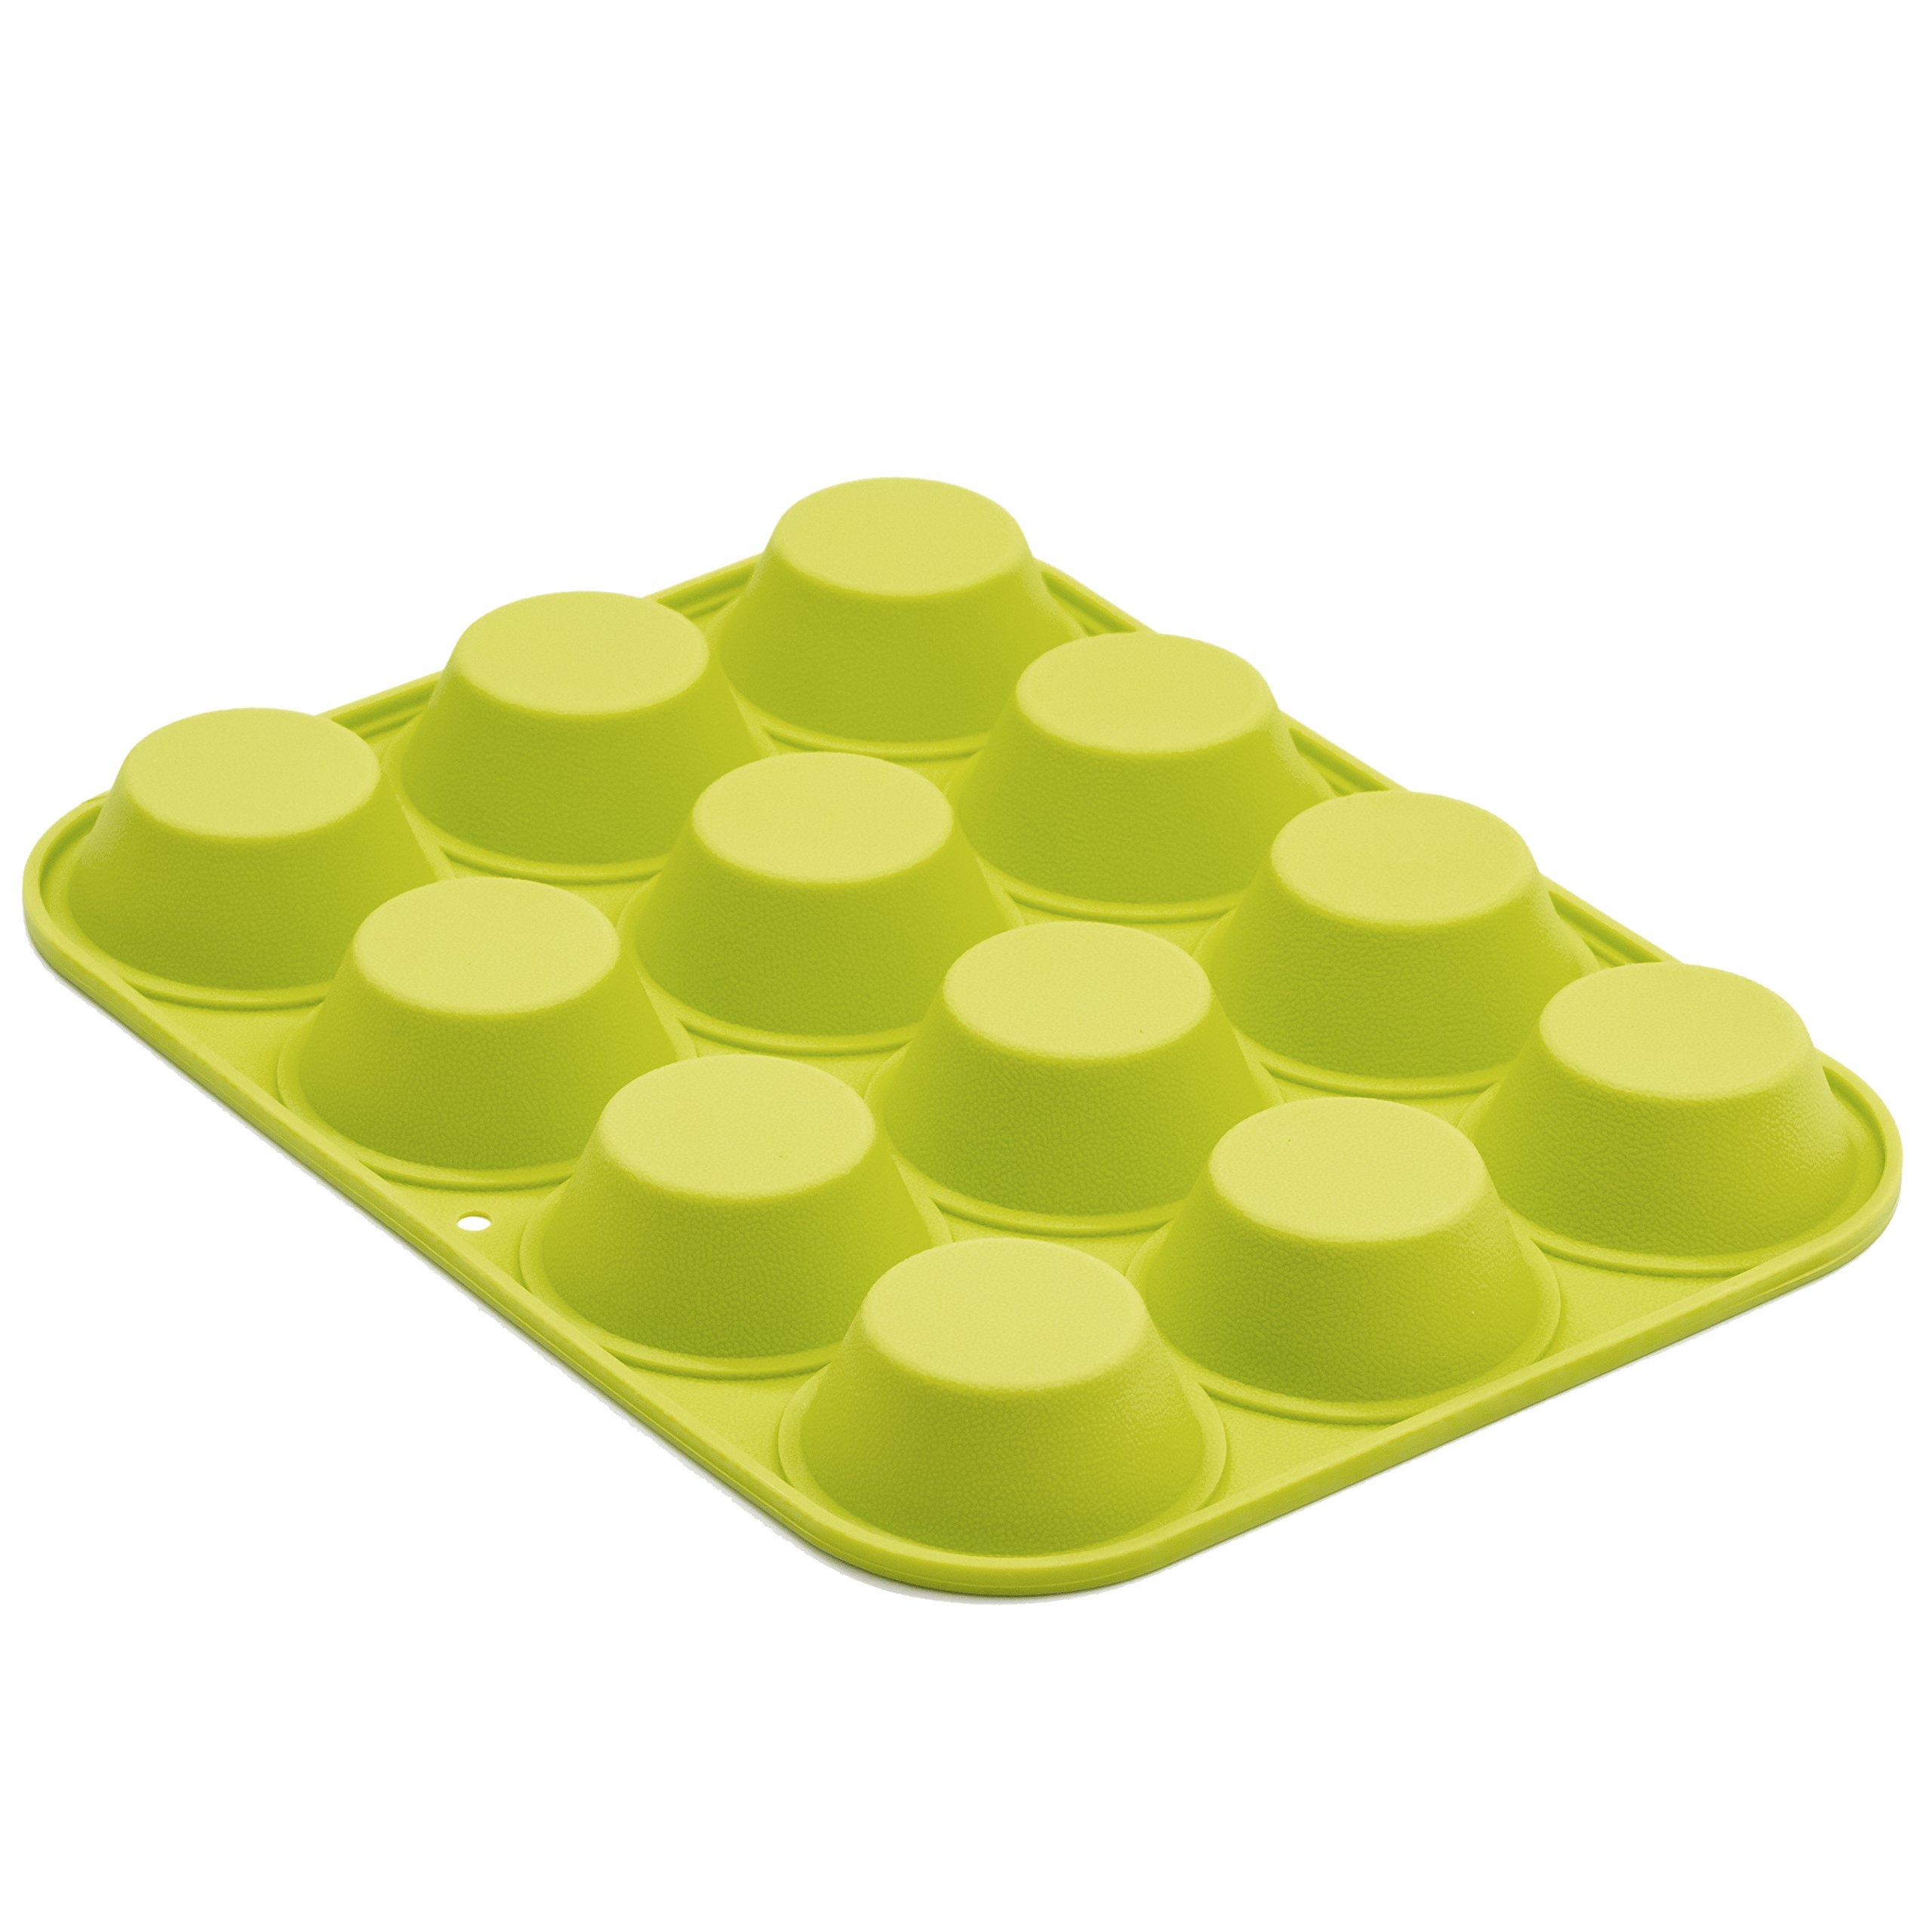 Marathon Housewares KW200011GR Premium Silicone 12 Cup Mini Muffin Pan, Green by Marathon Housewares (Image #2)